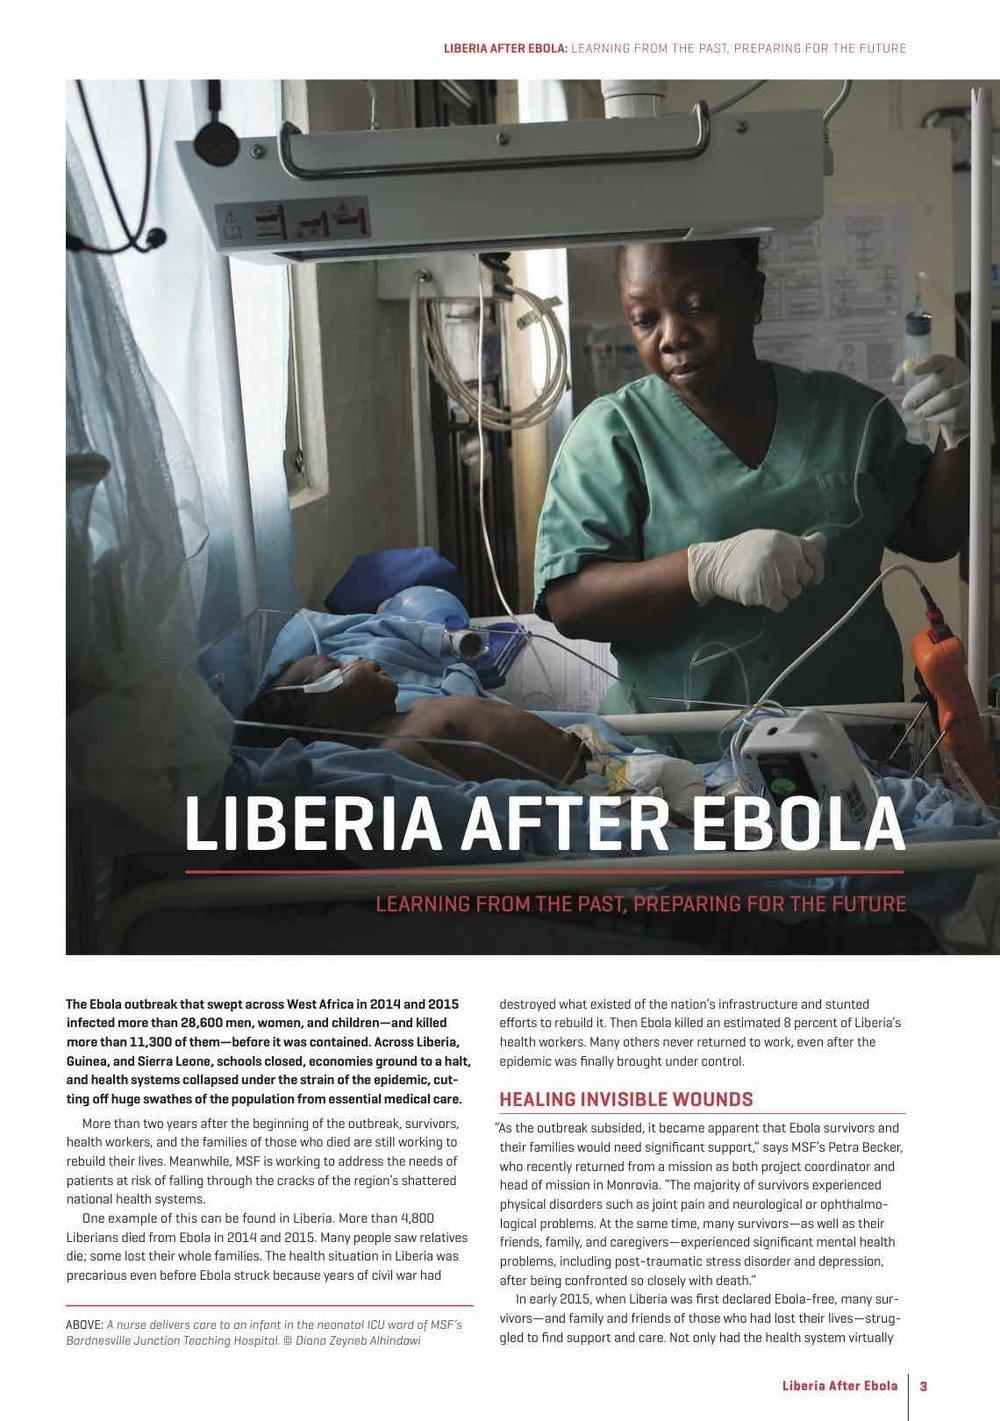 Diana Zeyneb Alhindawi_MSF_Alert_Life after Ebola_Liberia_2.jpg